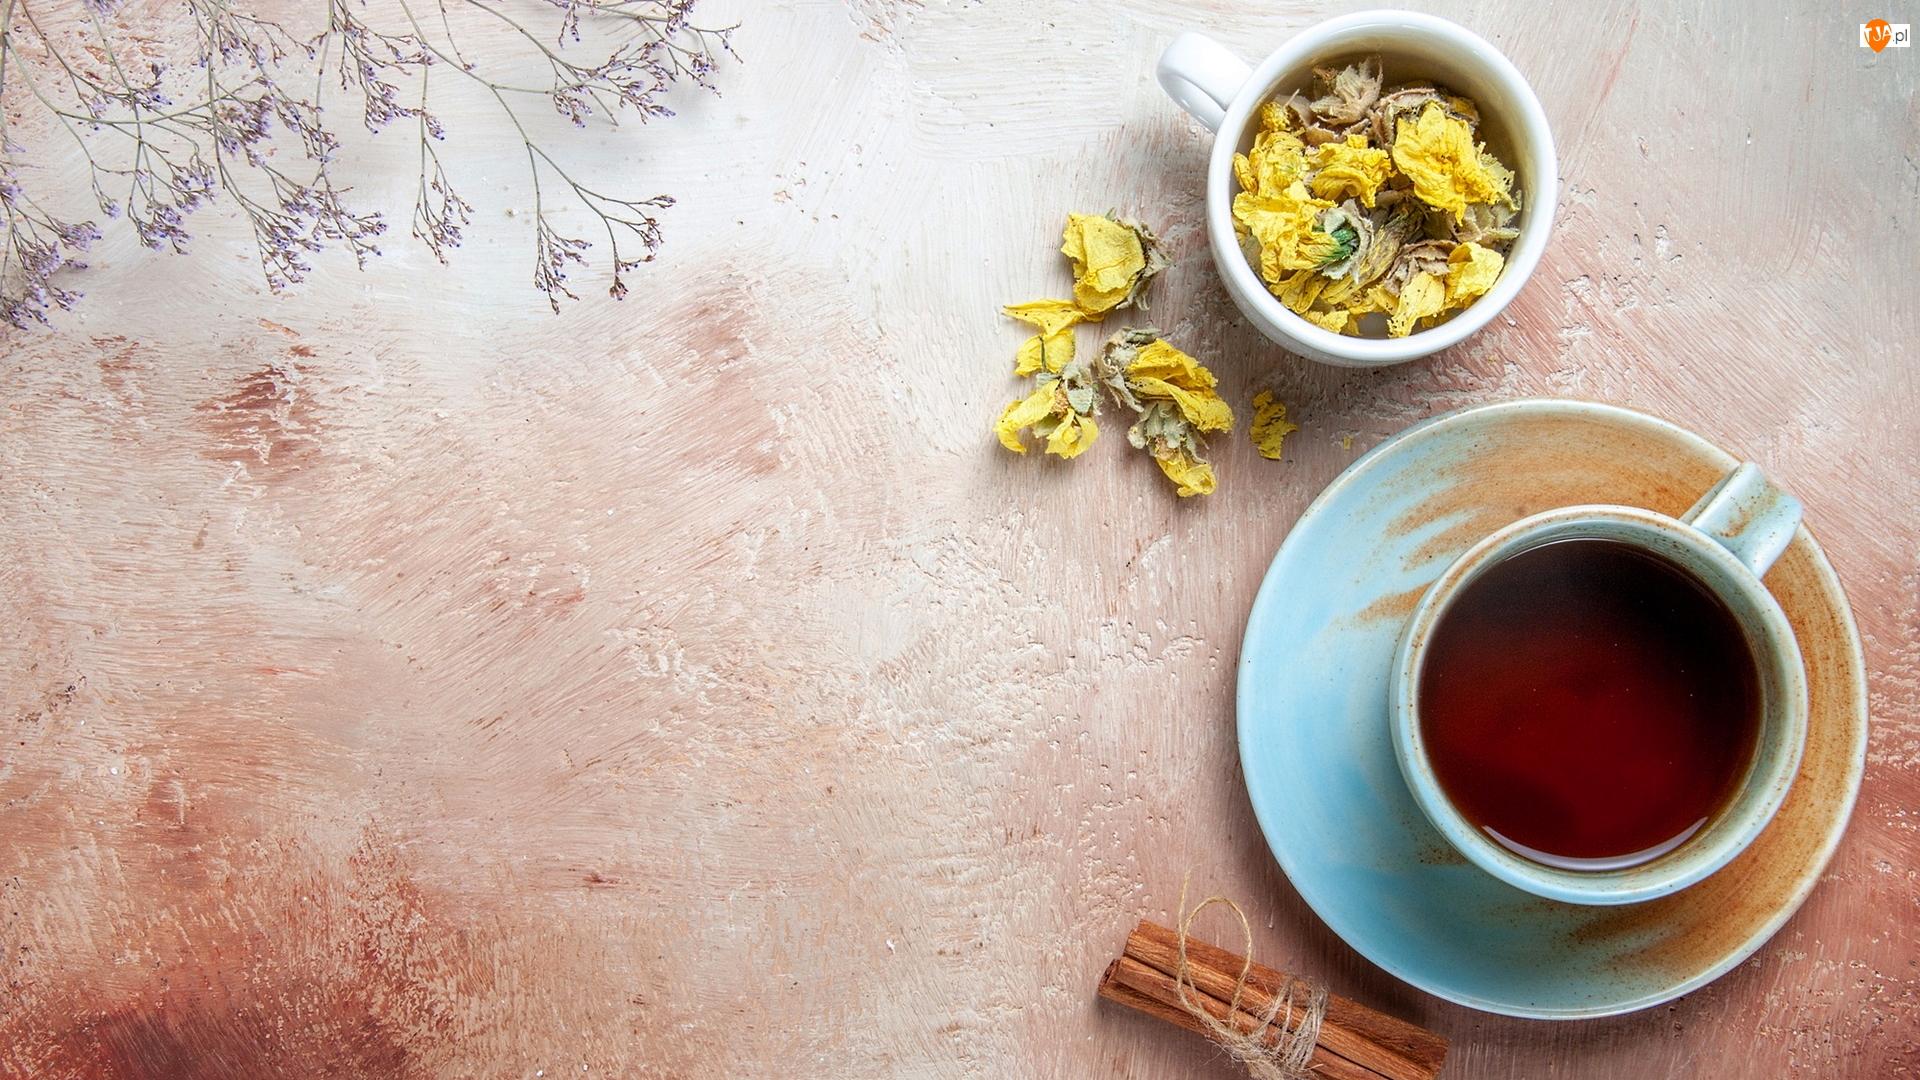 Cynamon, Kwiaty, Filiżanki, Herbata, Suche